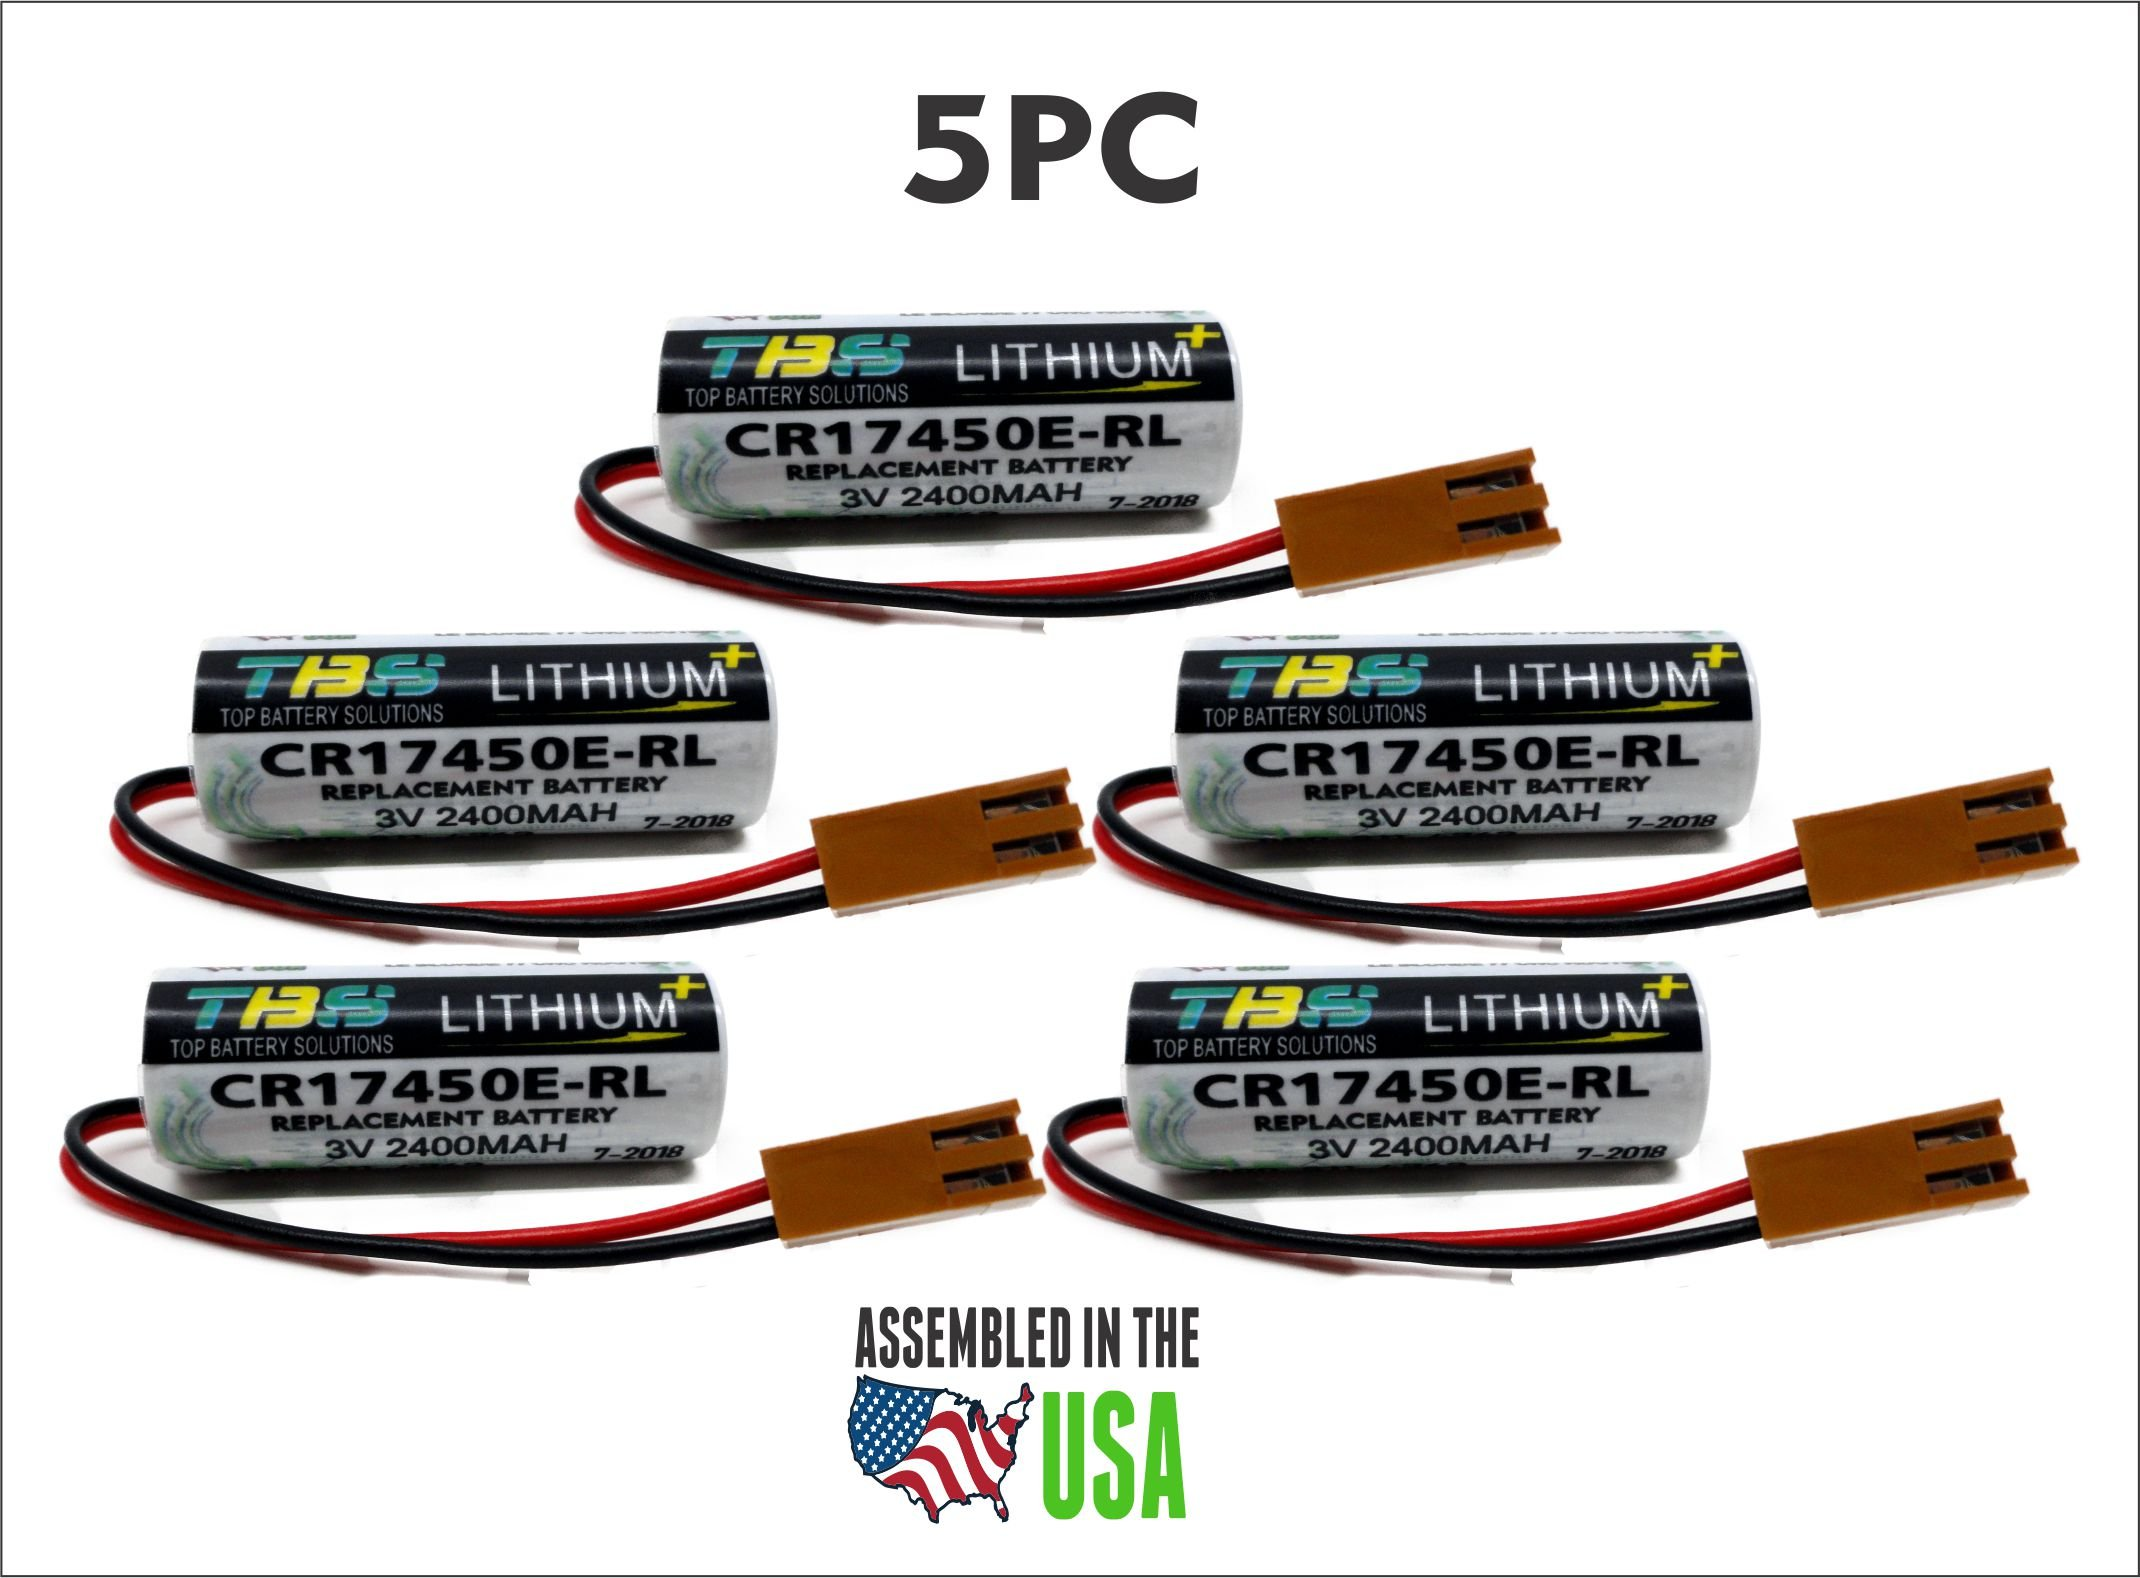 5PC GE Fanuc CR17450E-RL, A02B-0200-K102,PLC Replacement Battery 3.0V Lithium PLC